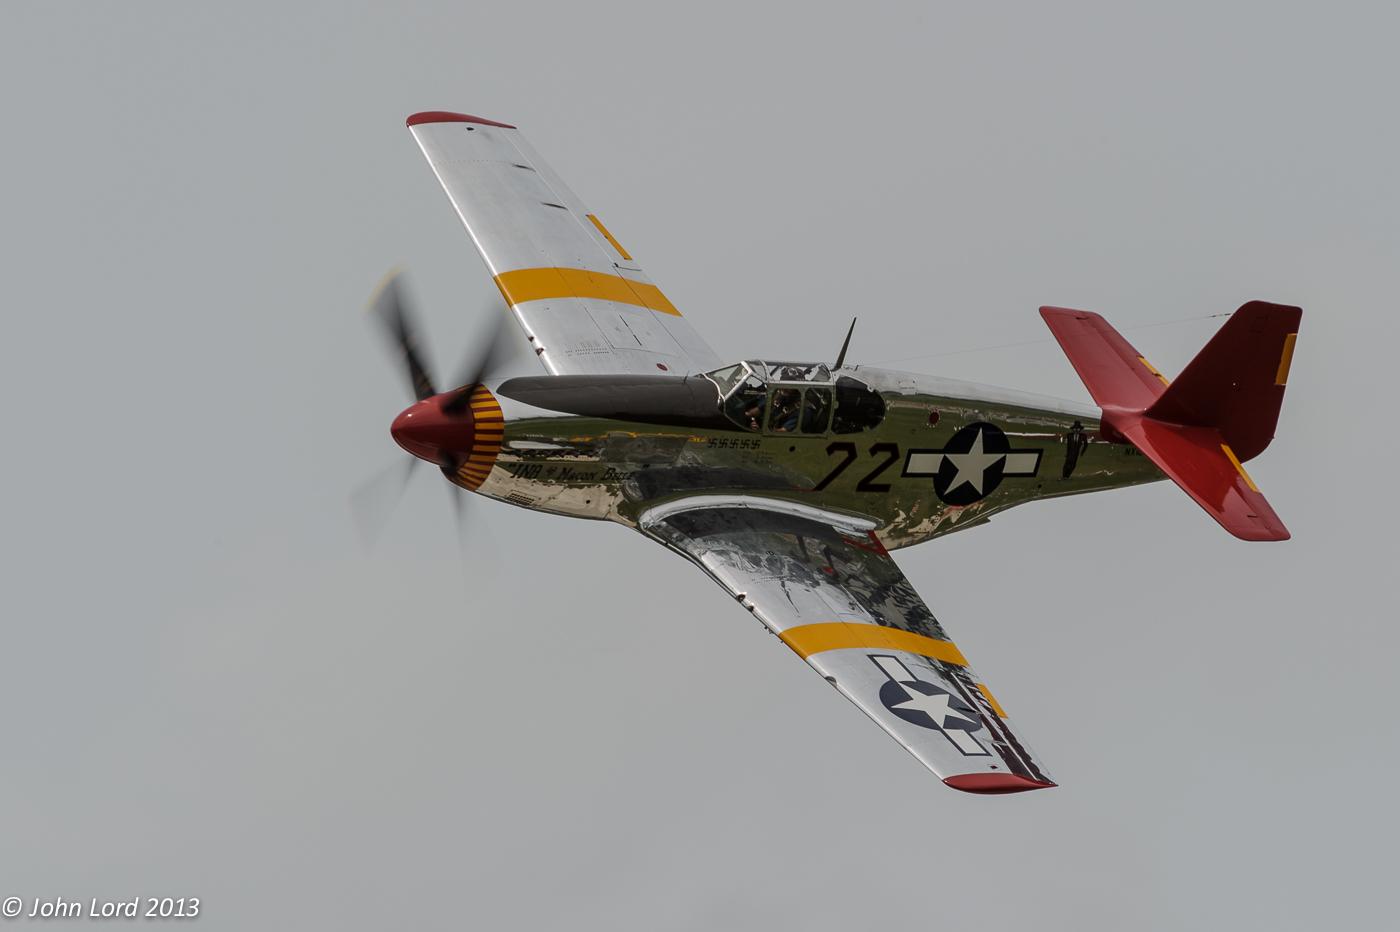 Red Tail P51 Mustang